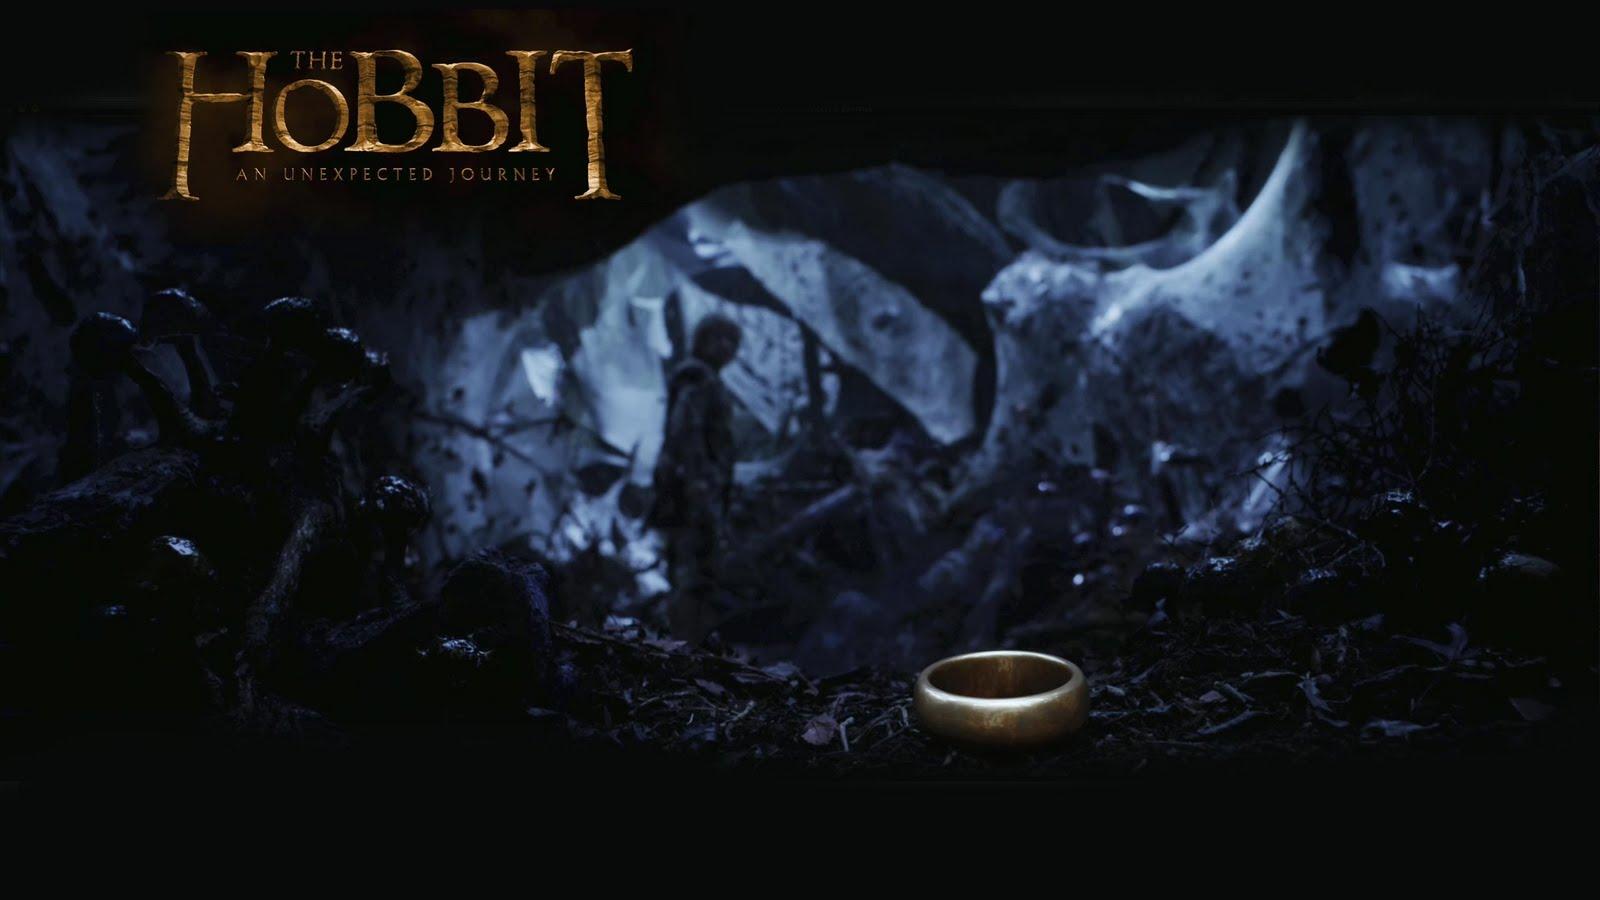 The Hobbit   The Ring Wallpaper   The Hobbit Wallpaper 33042240 1600x900